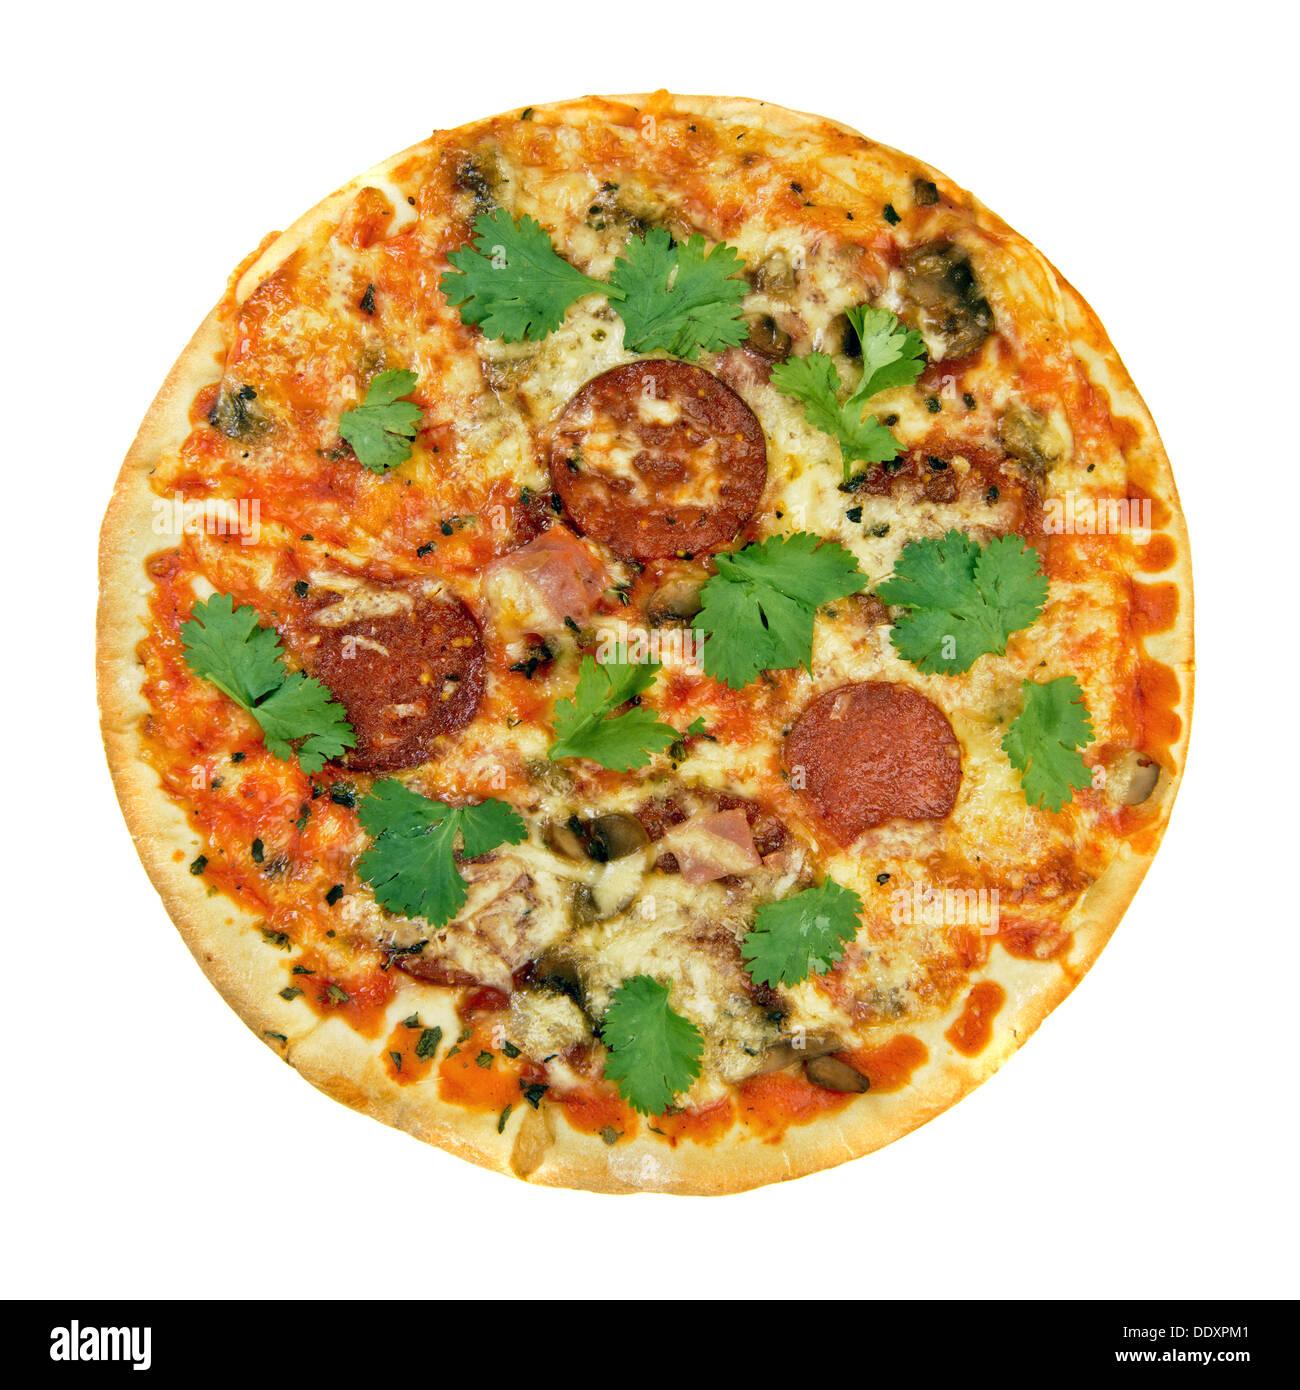 La cuisine fraîche aux herbes pizza au pepperoni isolated over white Photo Stock